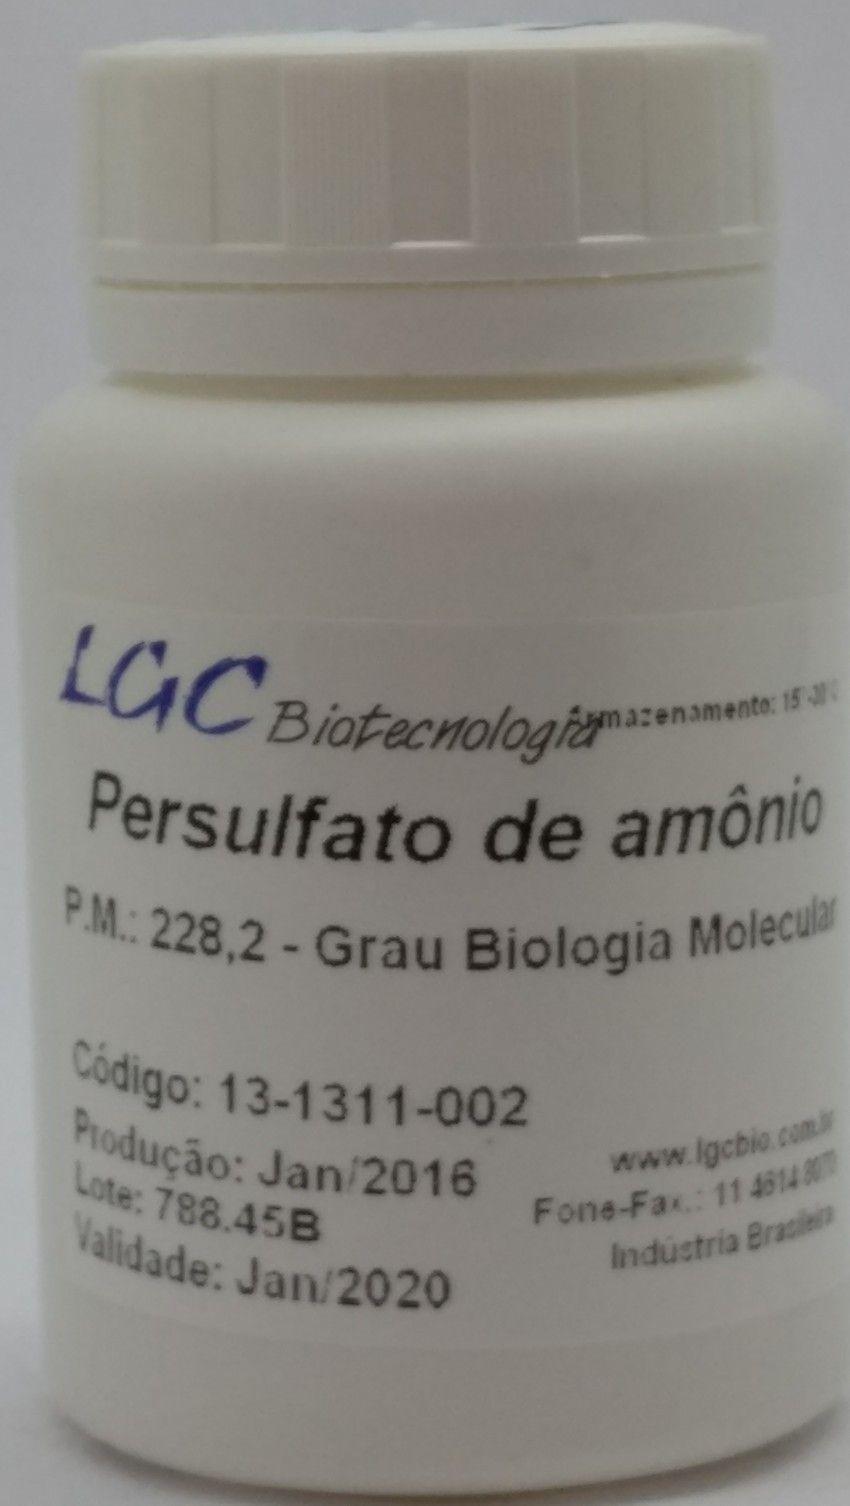 PERSULFATO DE AMÔNIO 25G